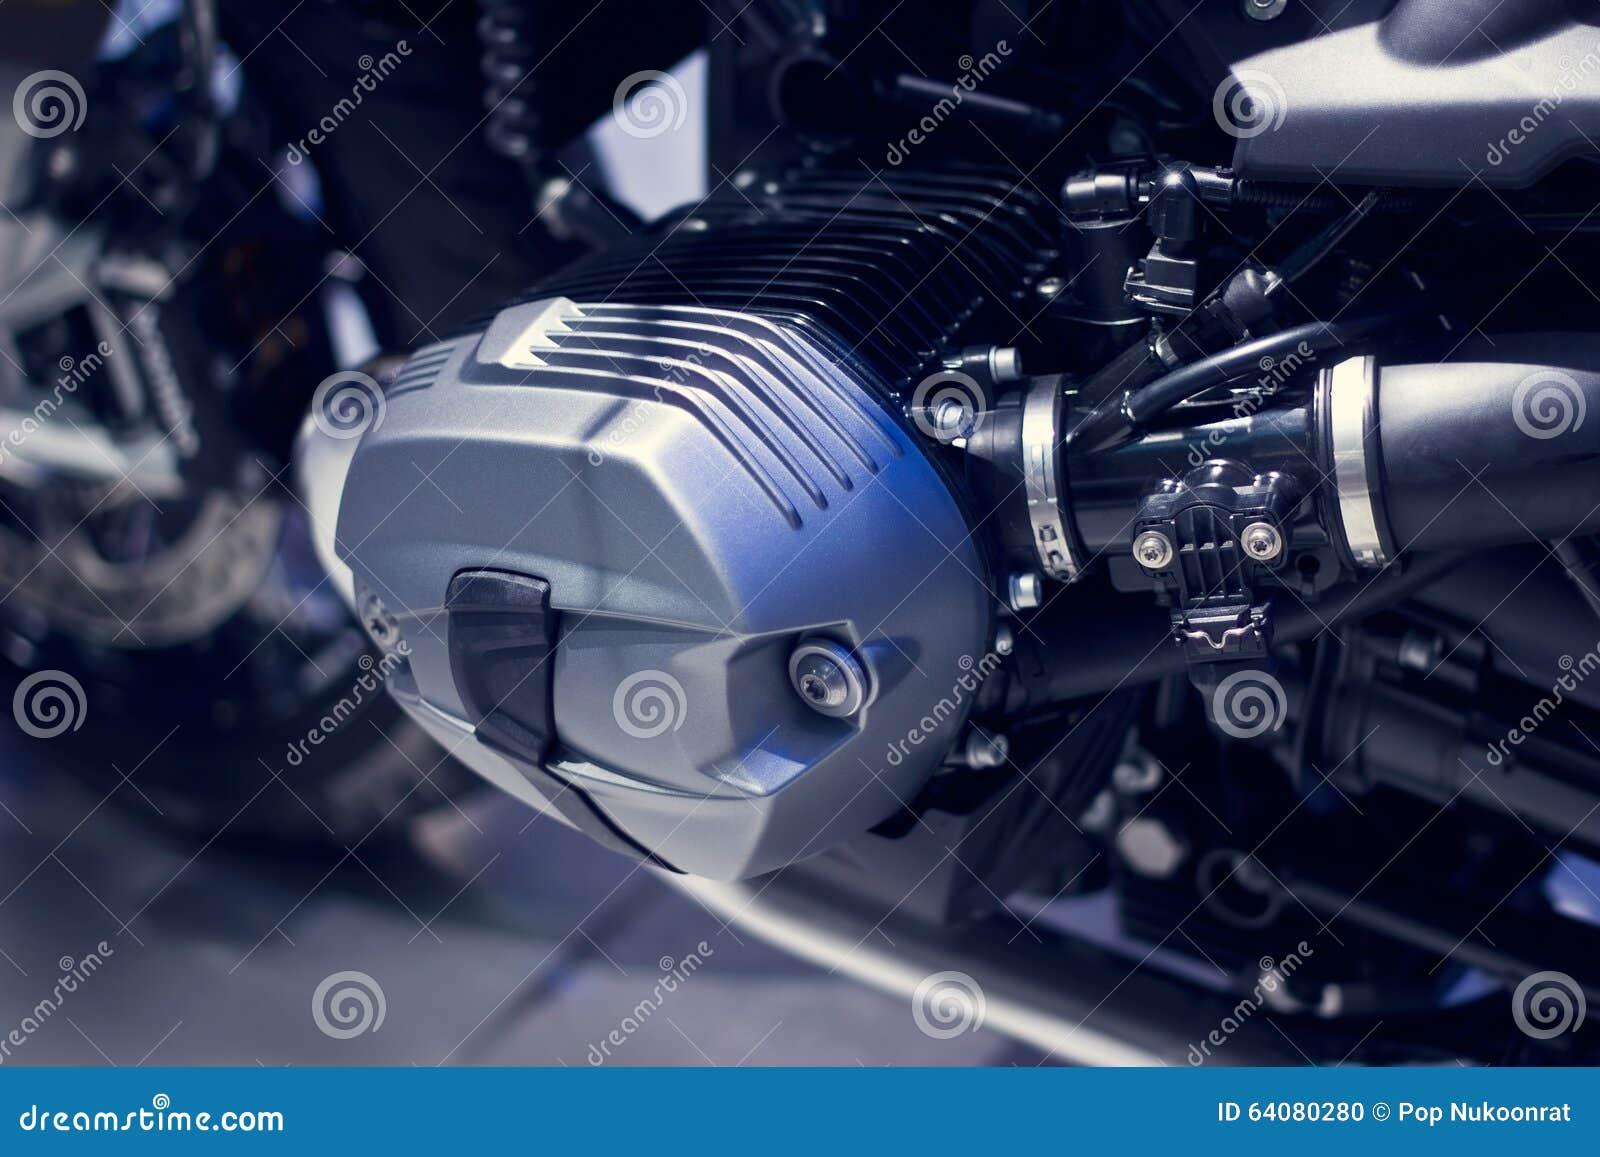 Motorcycle Engine Close Up On Dark Background Stock Photo Image Of Download Bike